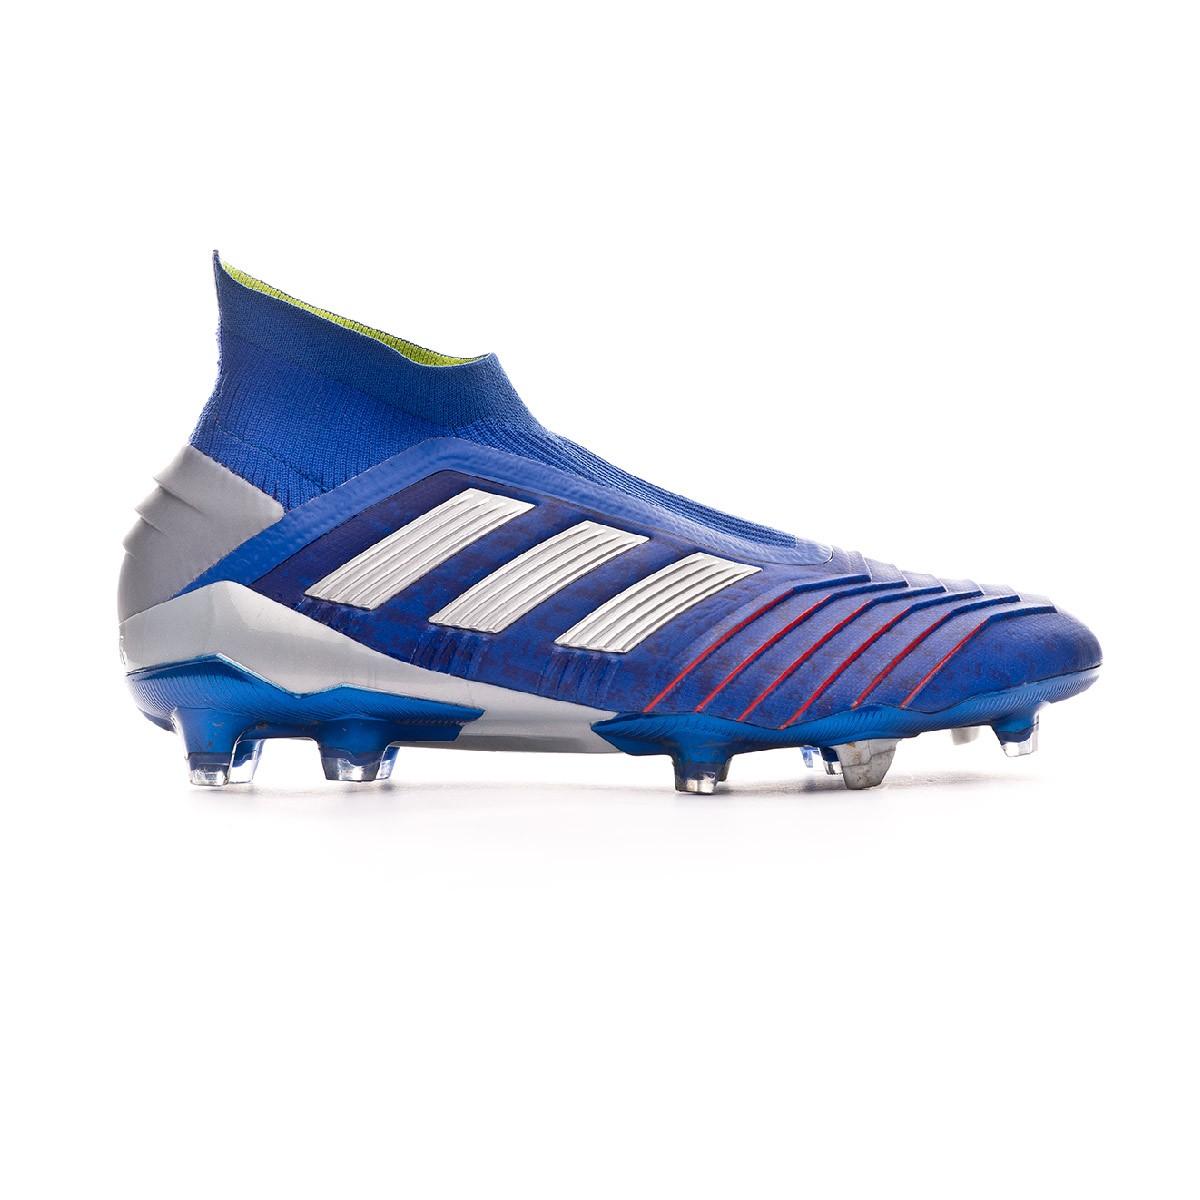 1bb3239aeb1 Football Boots adidas Predator 19+ FG Bold blue-Silver metallic-Active red  - Football store Fútbol Emotion